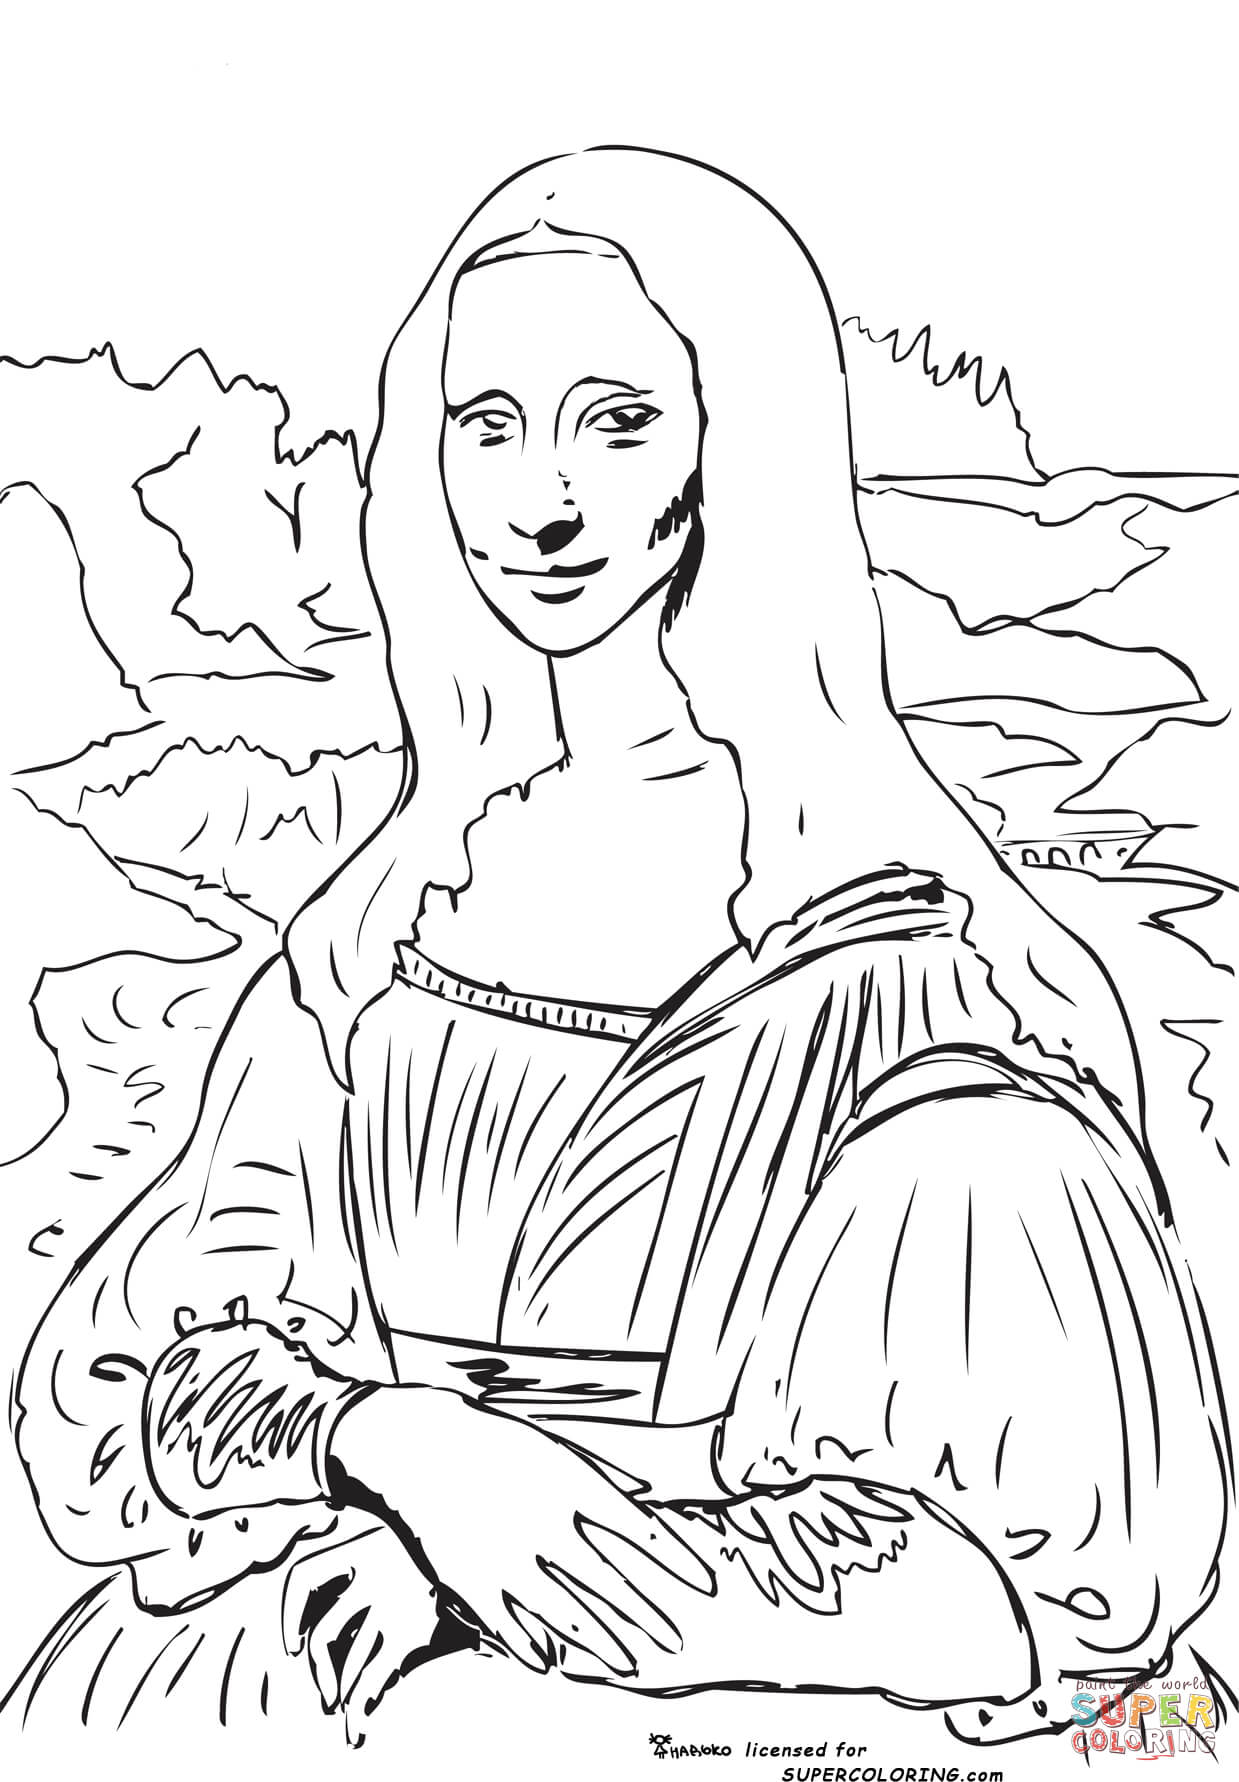 Mona Lisa La Gioconda By Leonardo Da Vinci Coloring Page